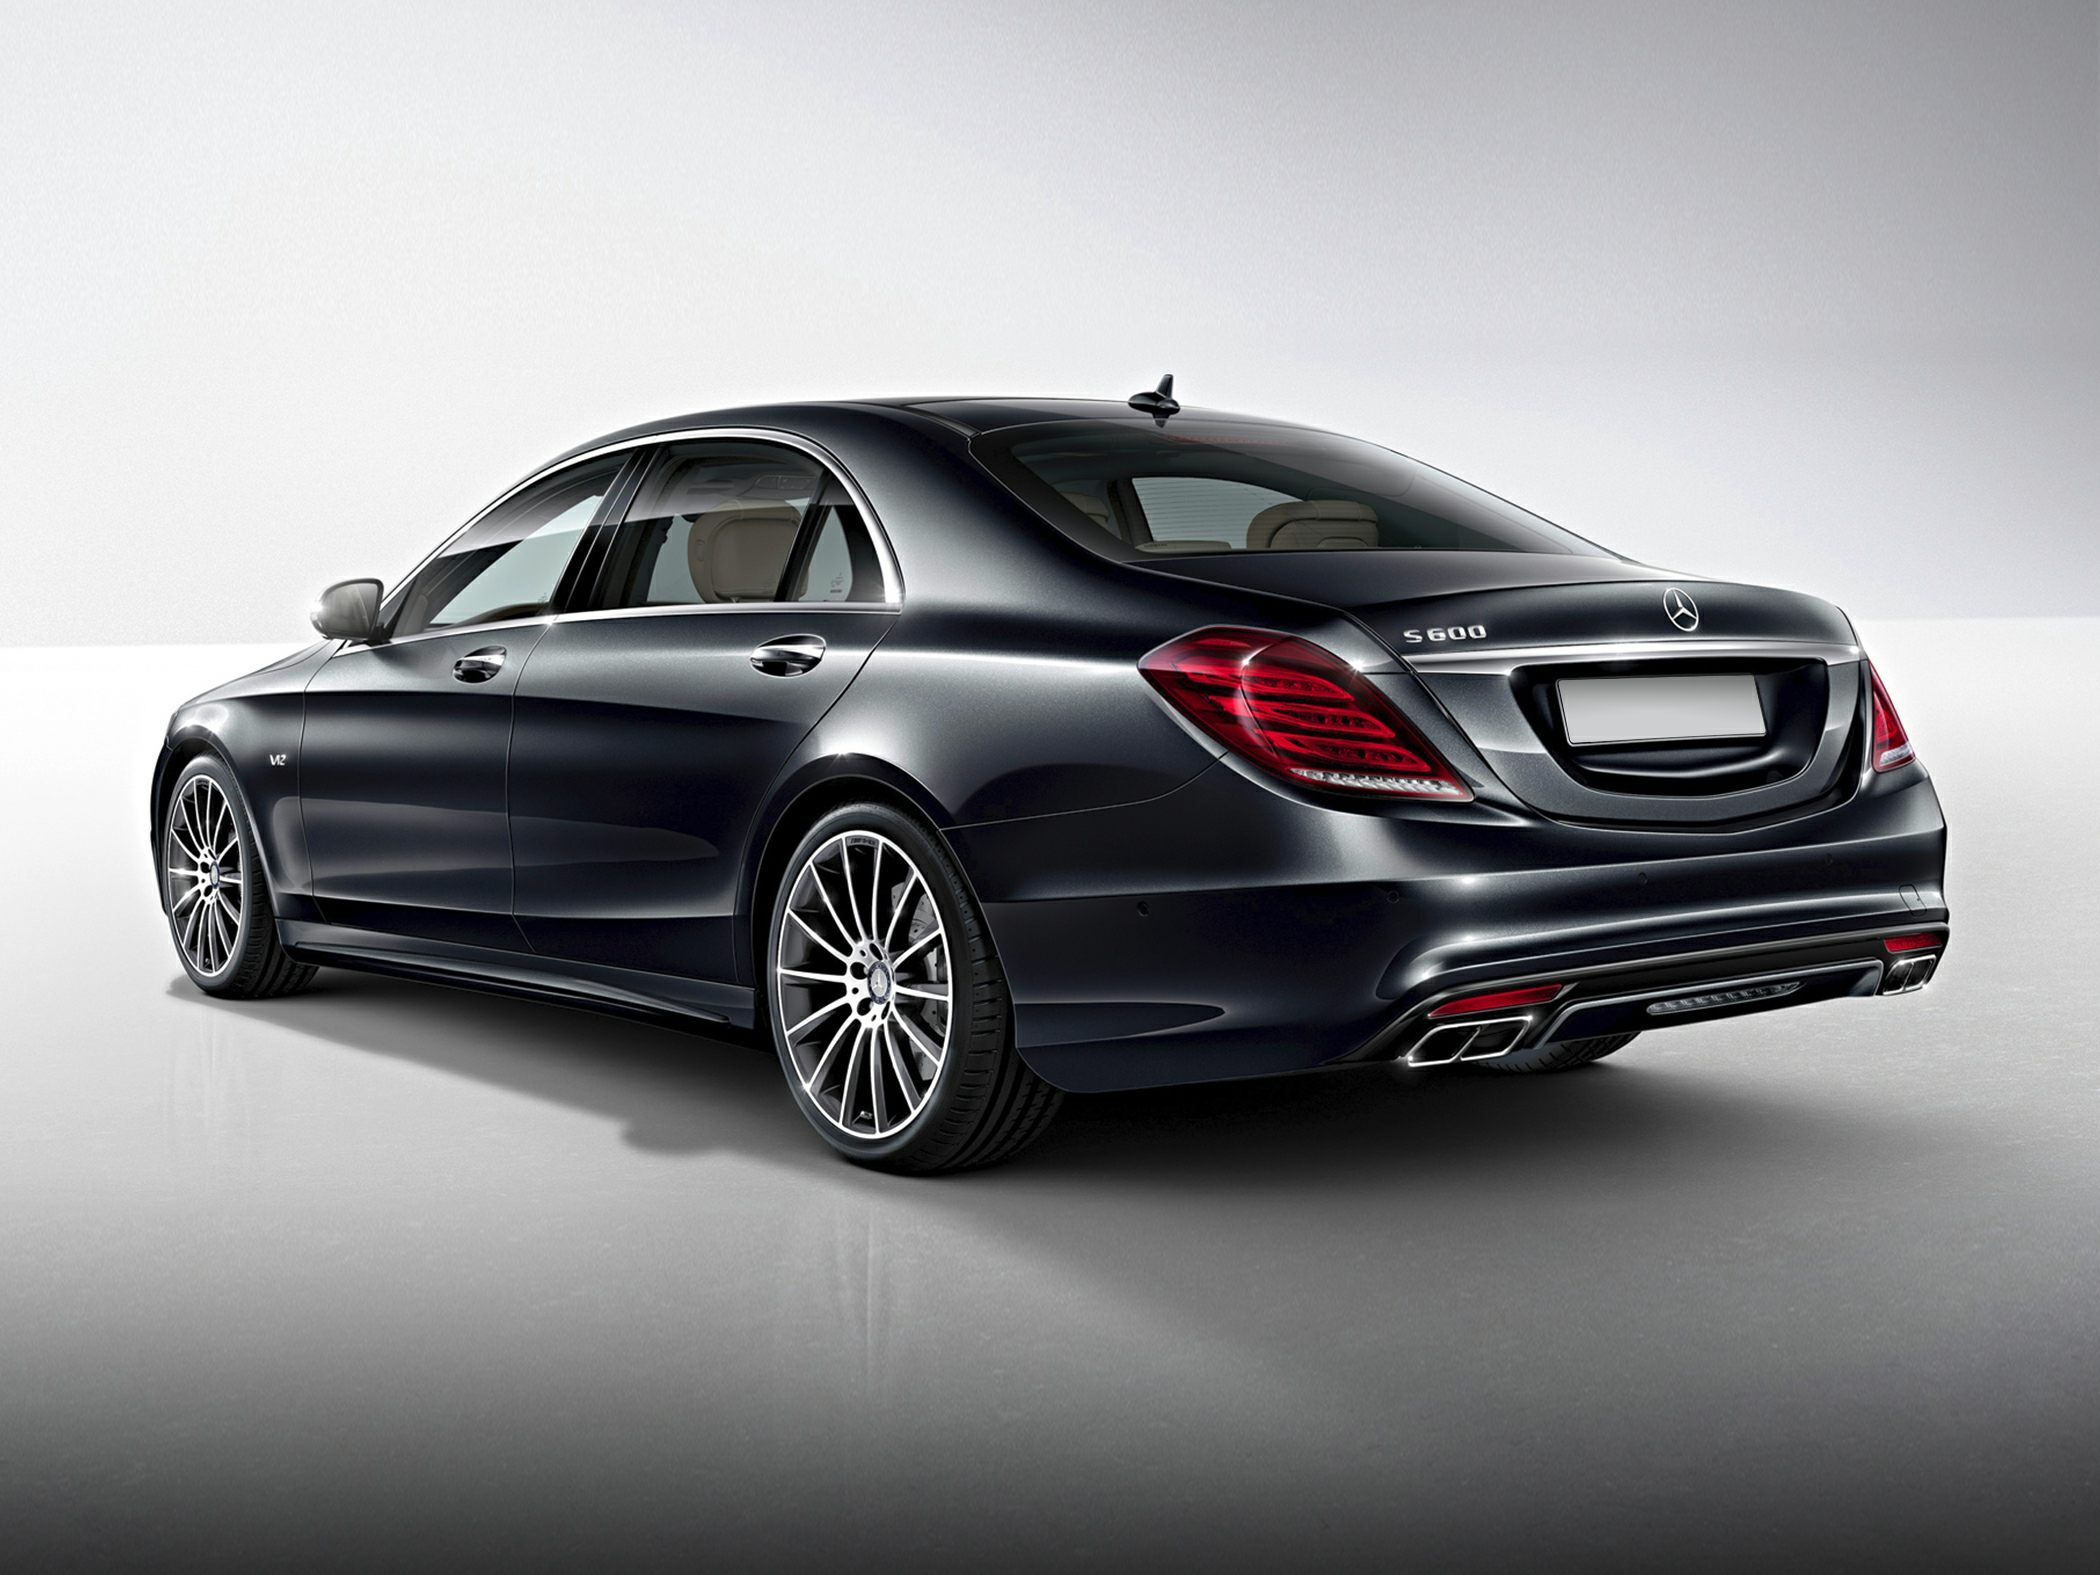 Benz Cl500 2015 2015 Mercedes-benz S600 Rear